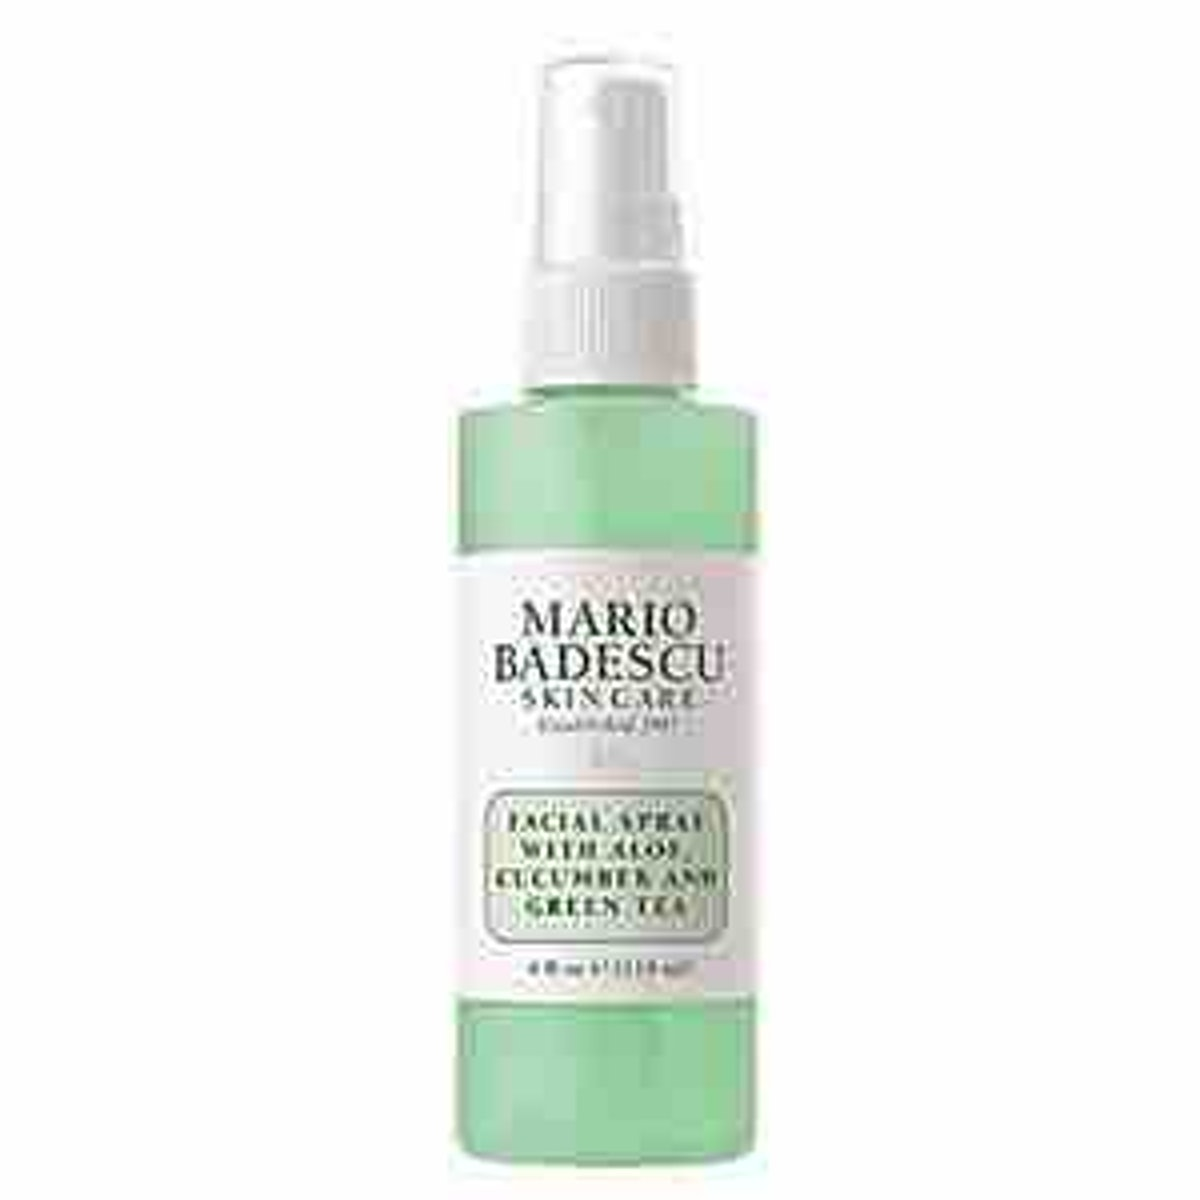 Facial Spray With Aloe, Cucumber And Green Tea